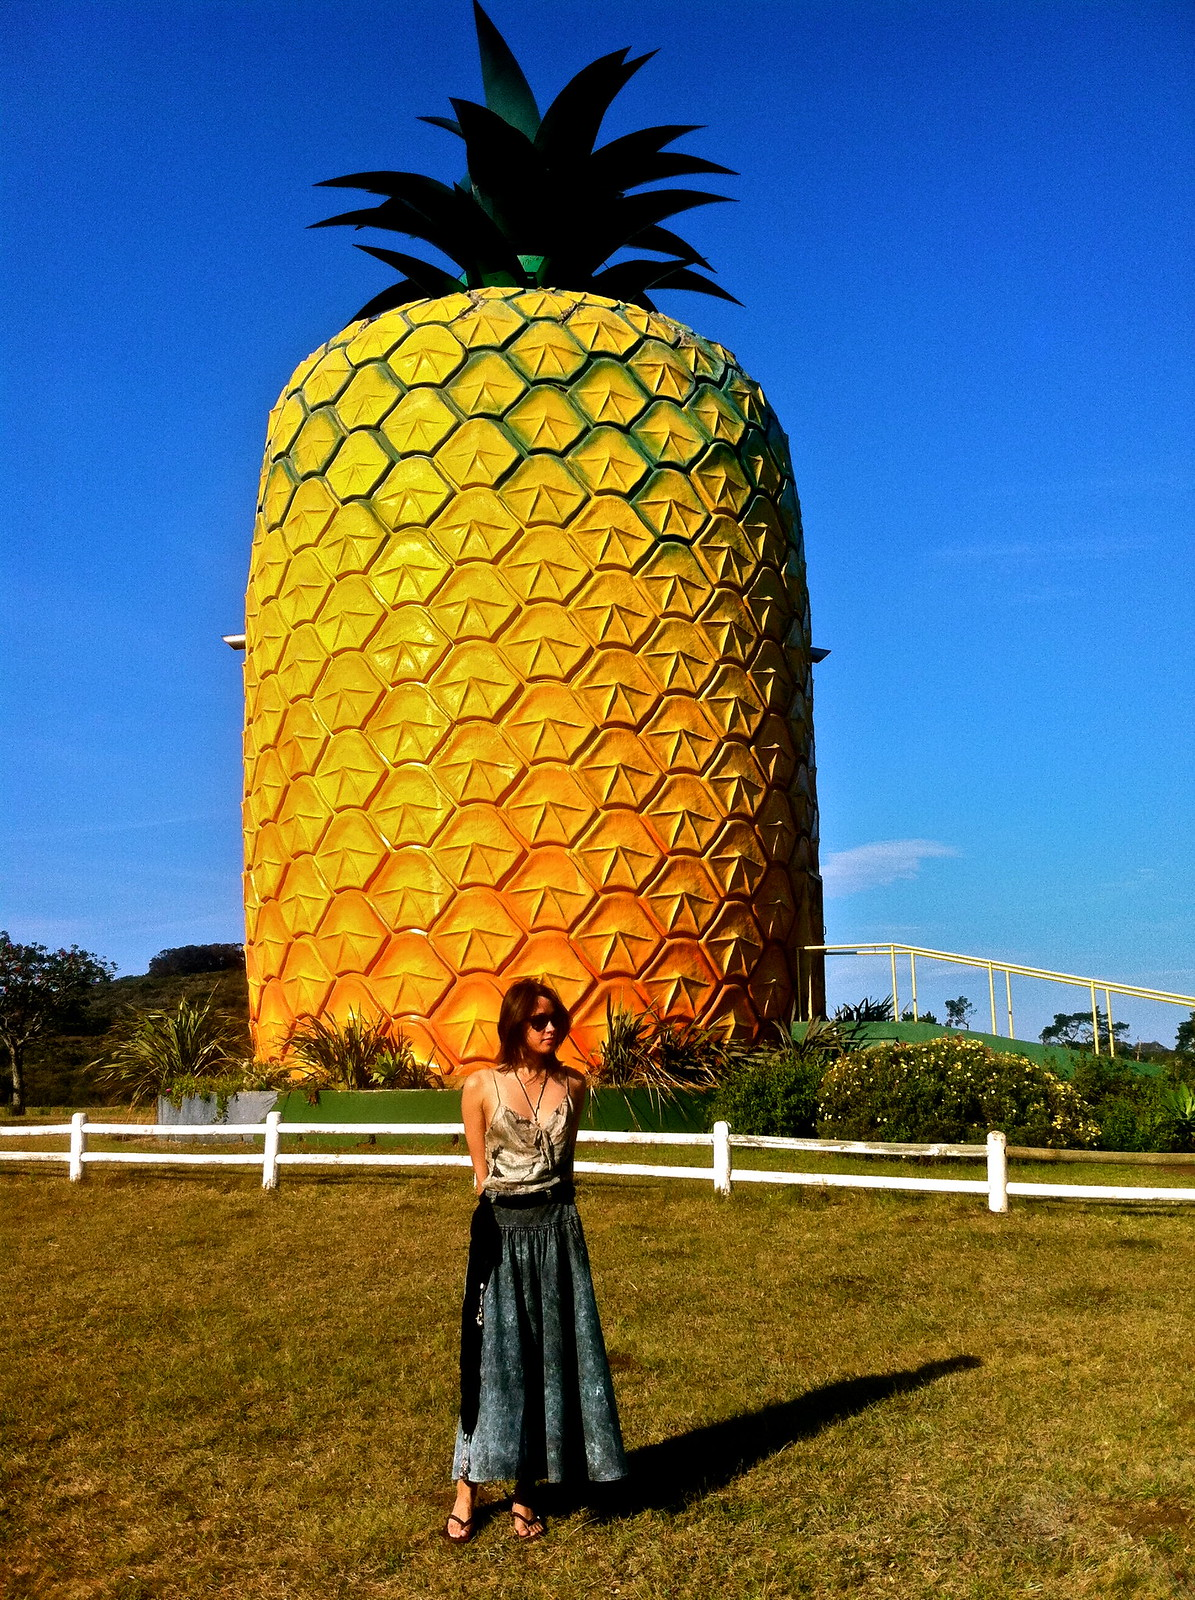 The Big Pineapple, Bathurst